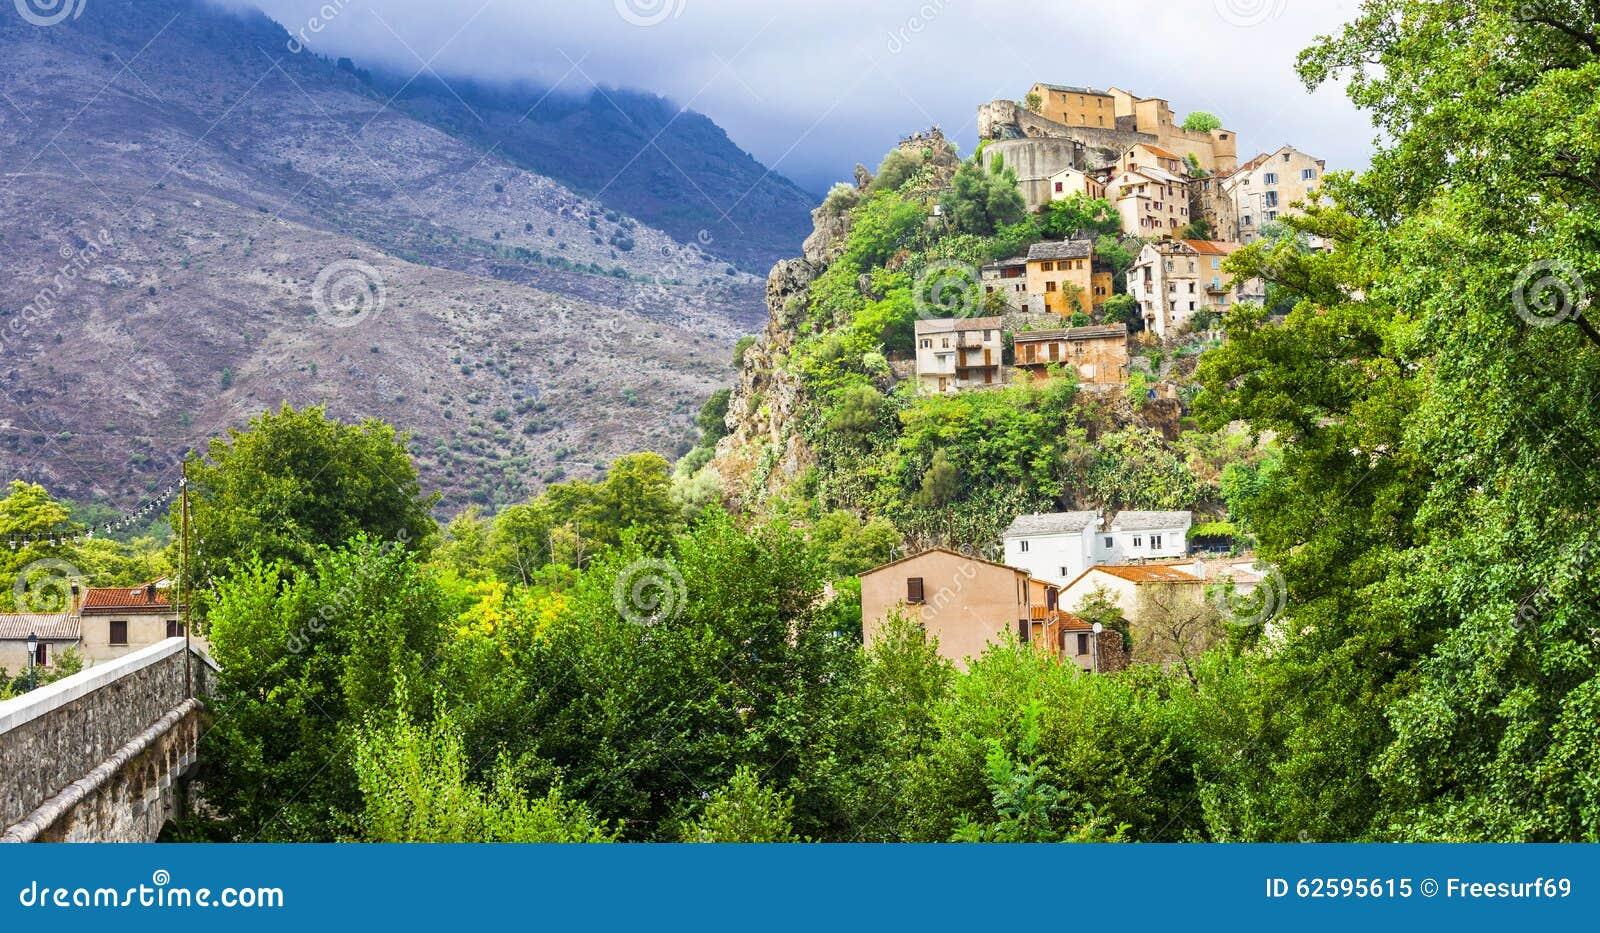 Corte gammal stad i Korsika